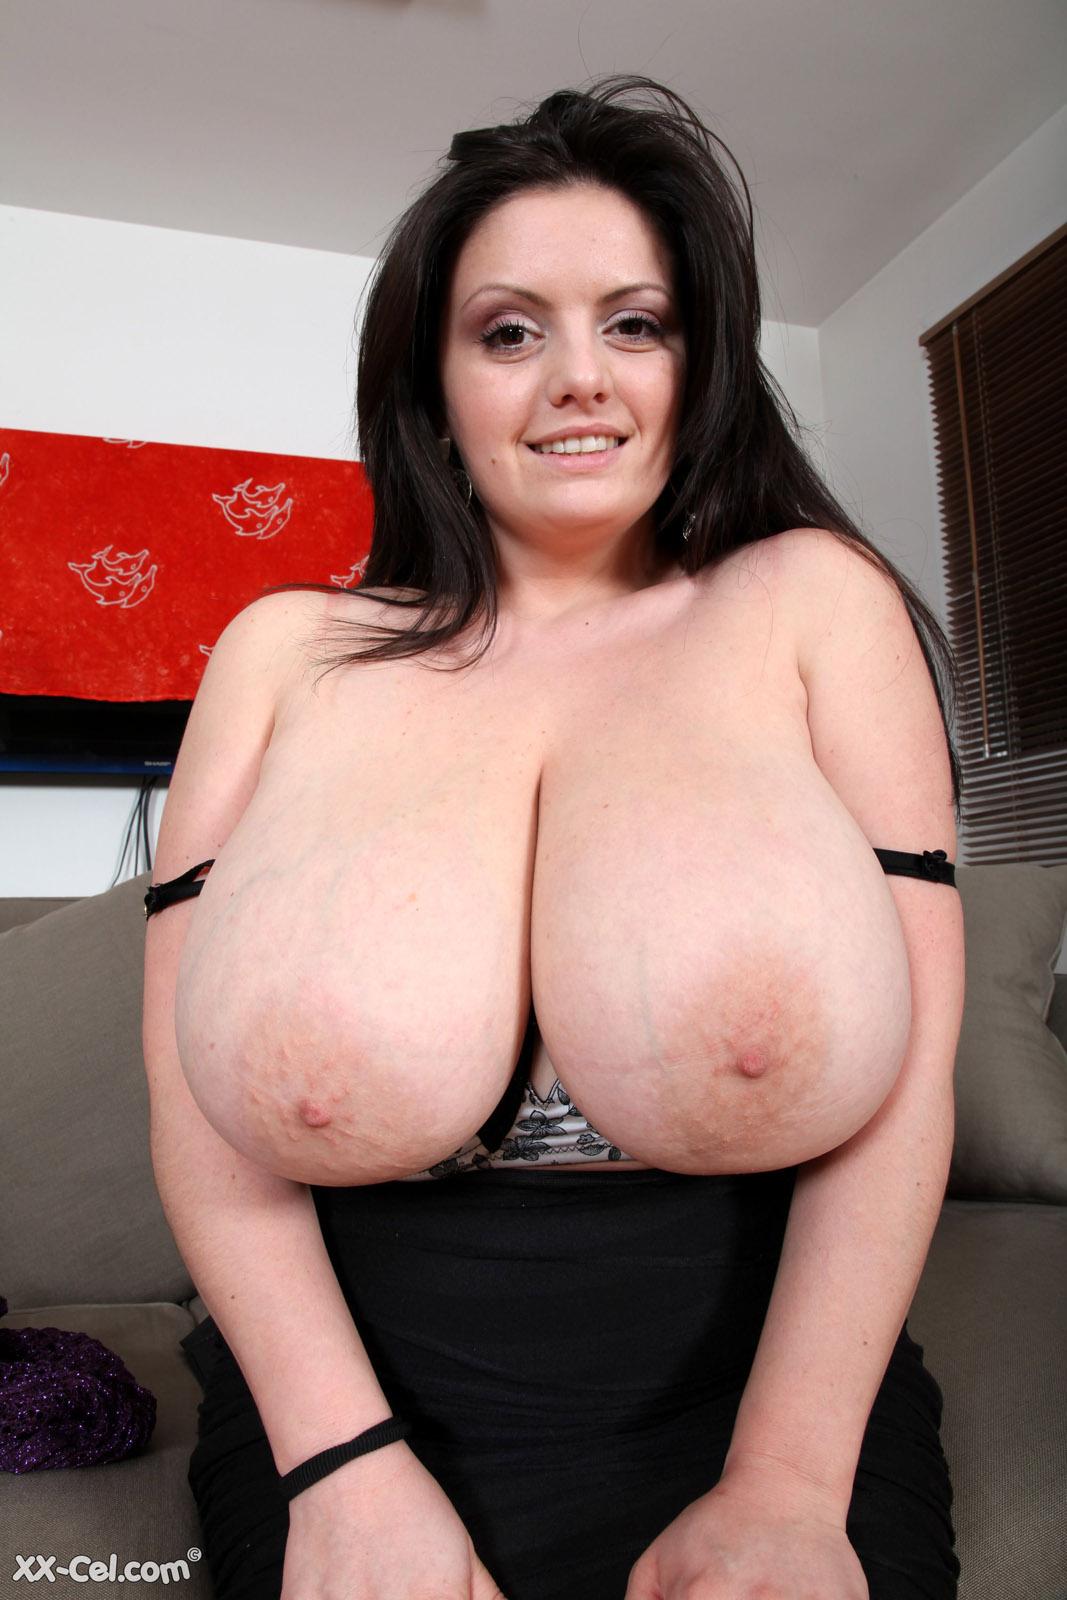 tits Arianna nude sinn